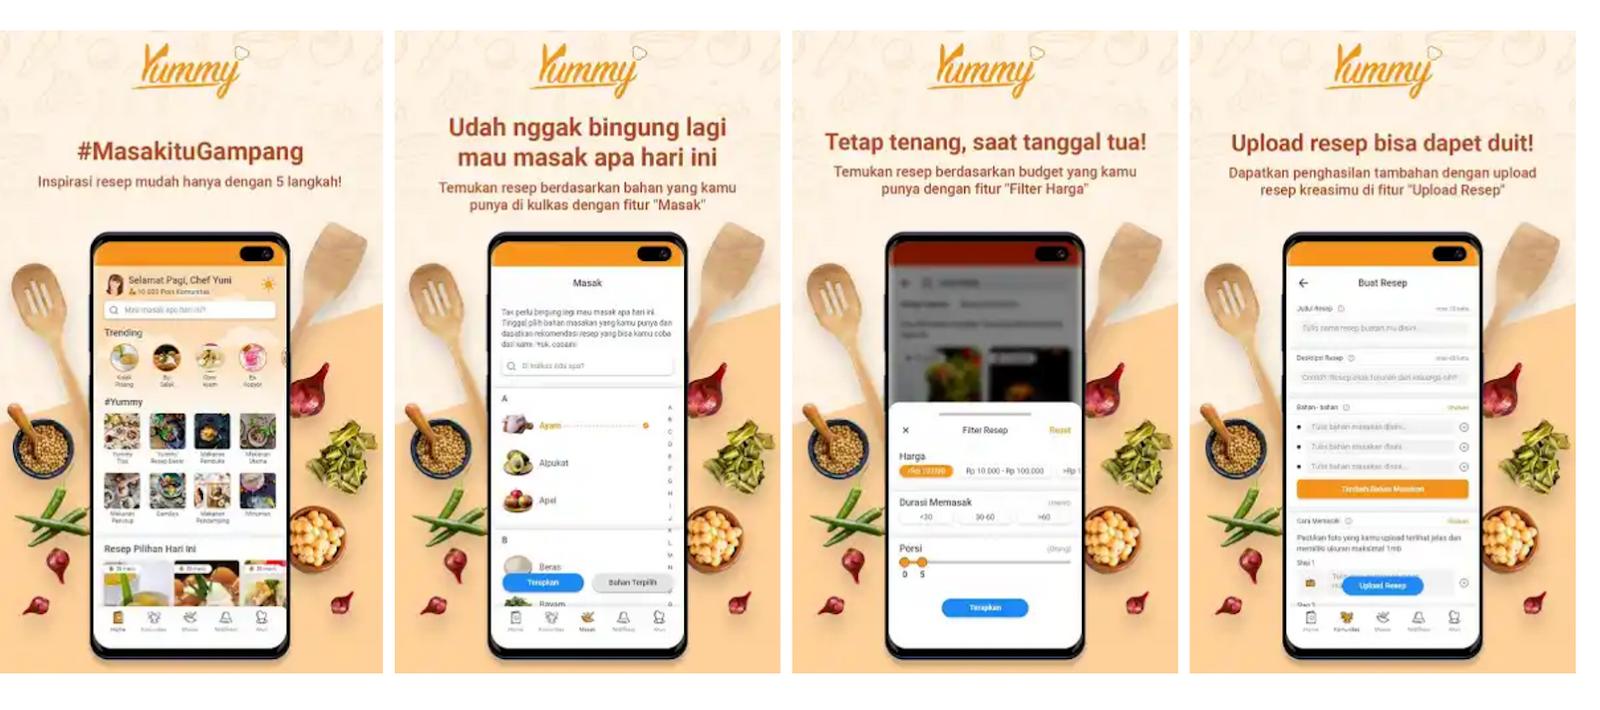 Yummy Apk : Download aplikasi YummY Apk Dapat uang Gratis